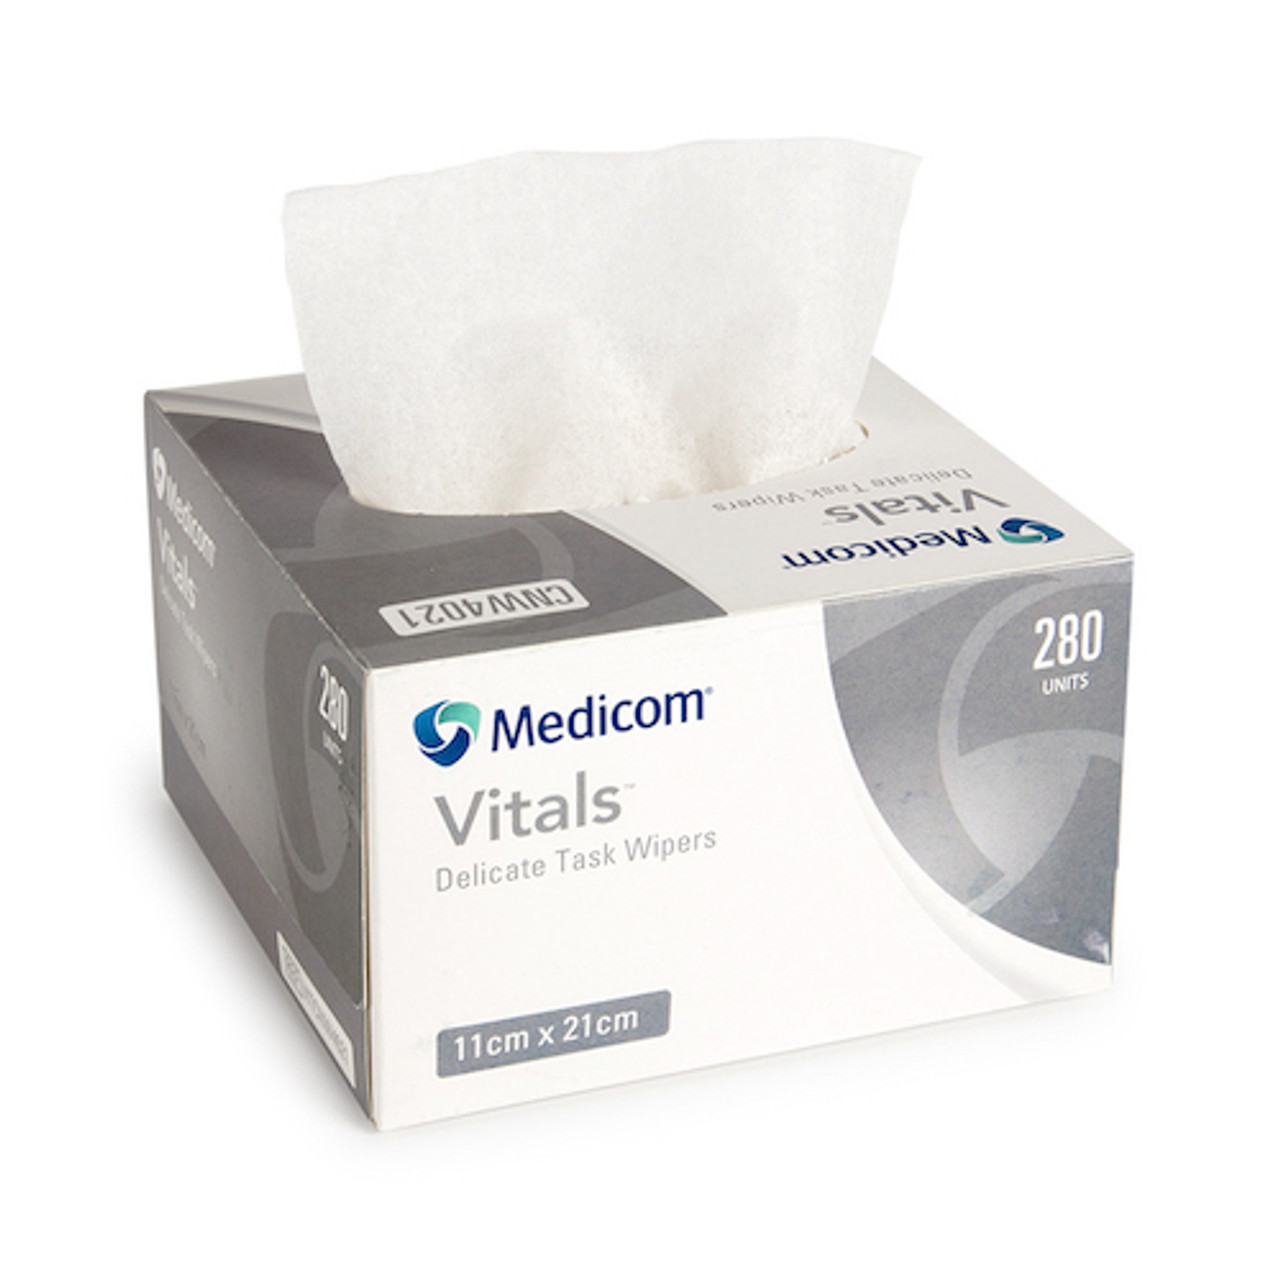 Medicom Vitals Delicate Task Wiper 280 Wipers Low Lint Wipers